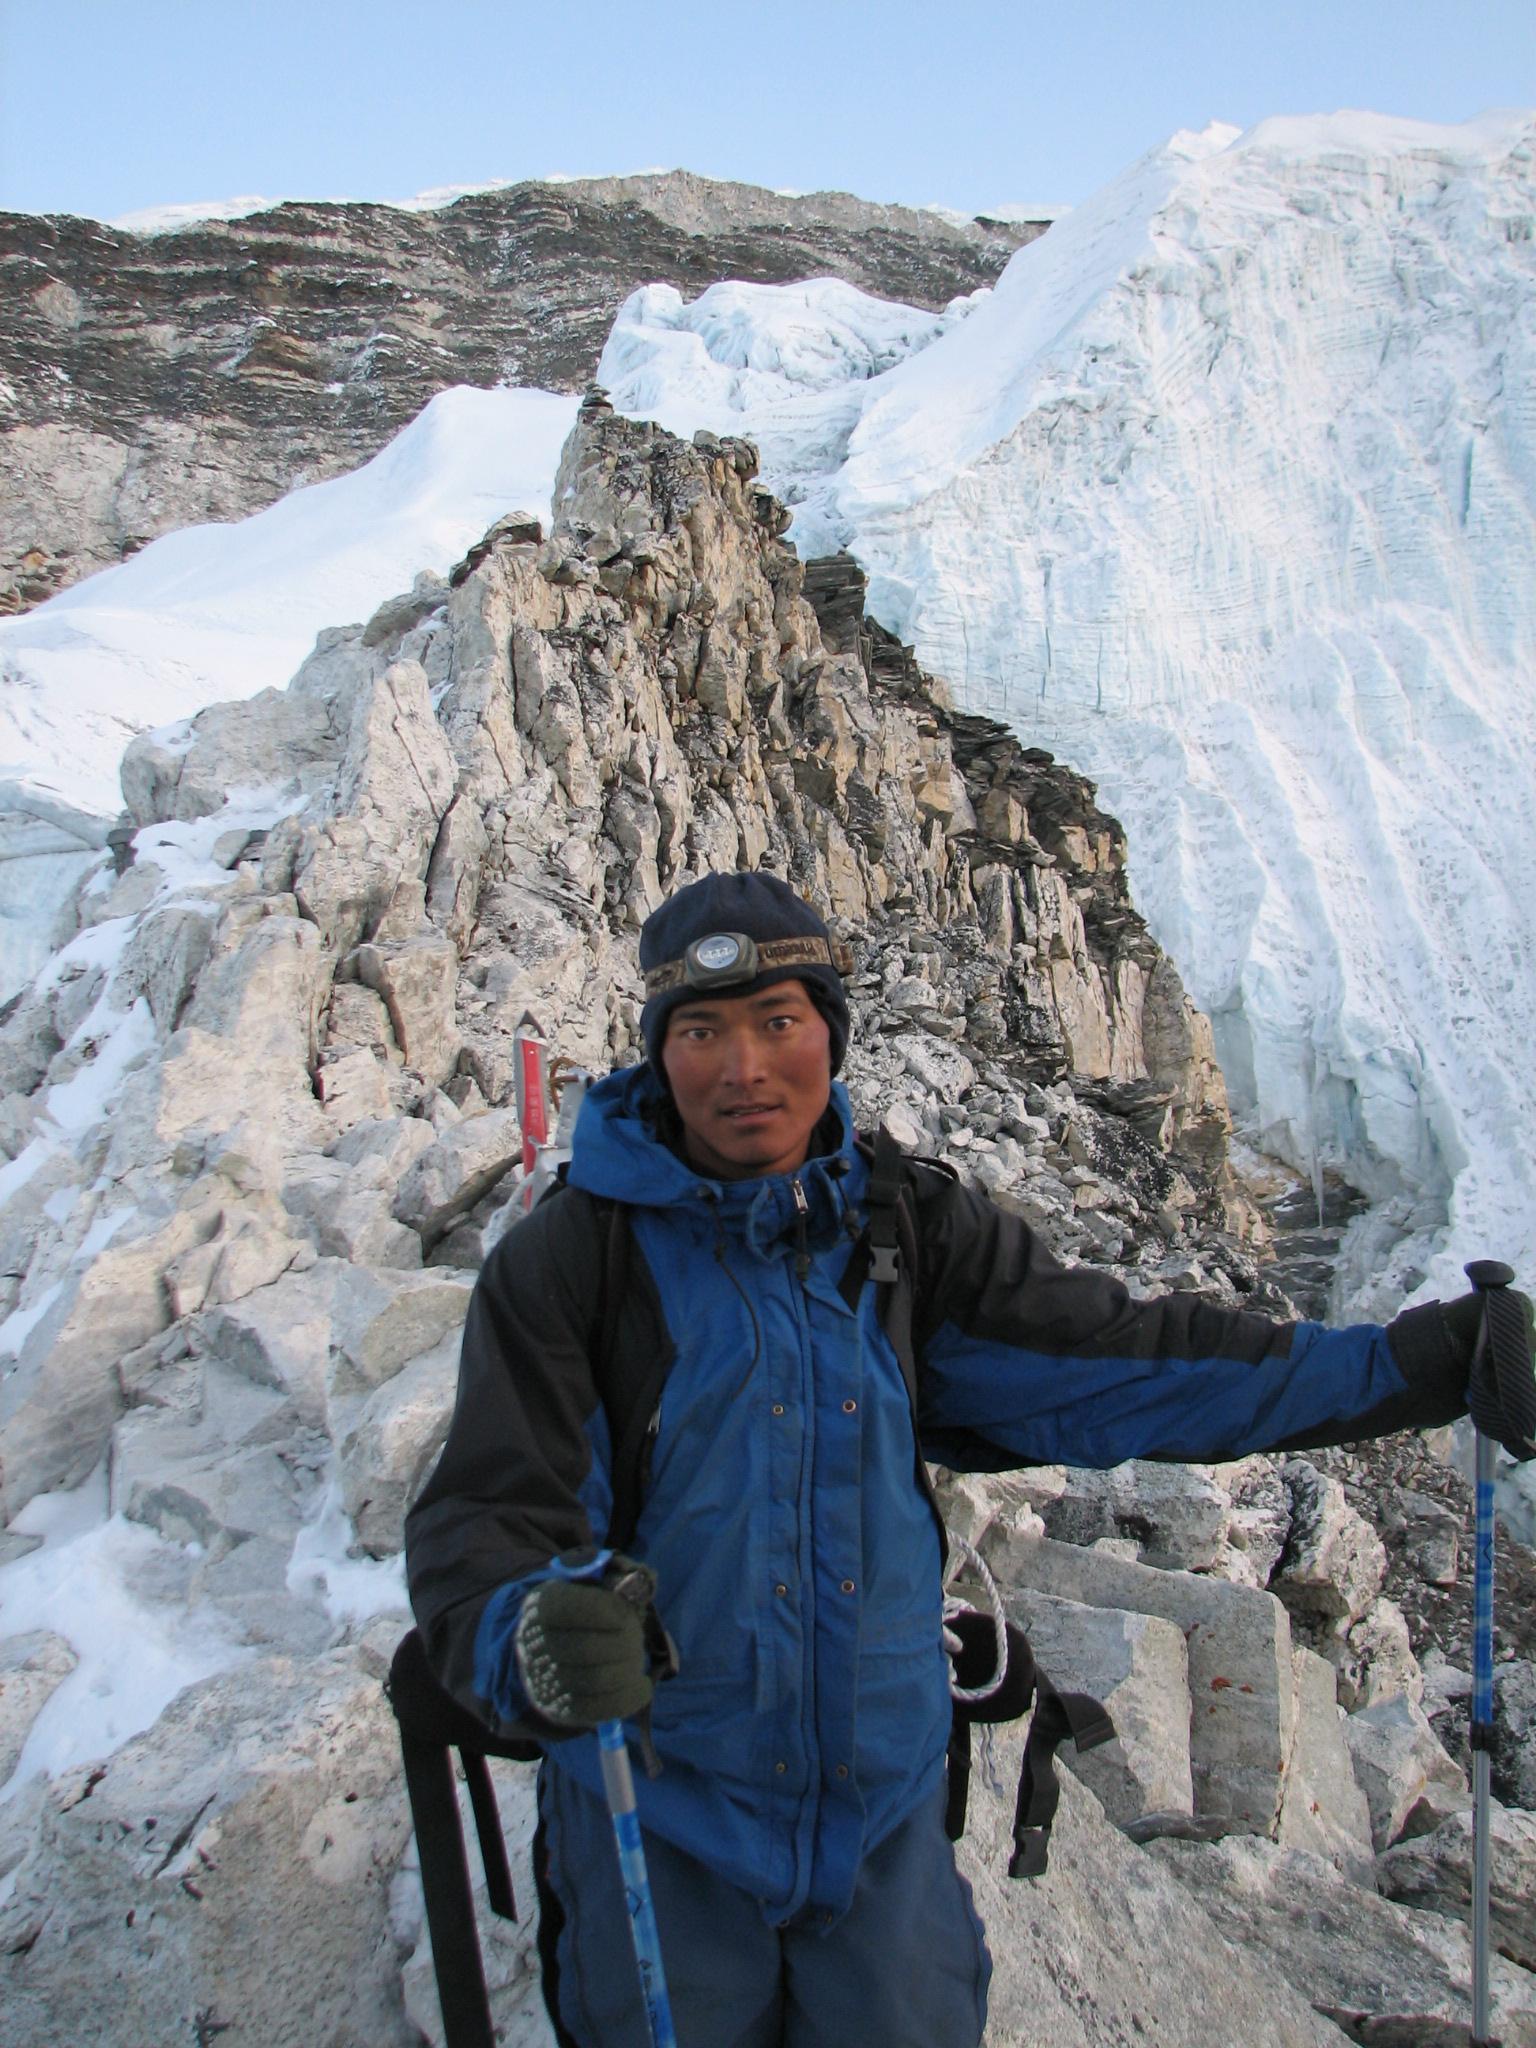 how sherpas misunderstood as guide